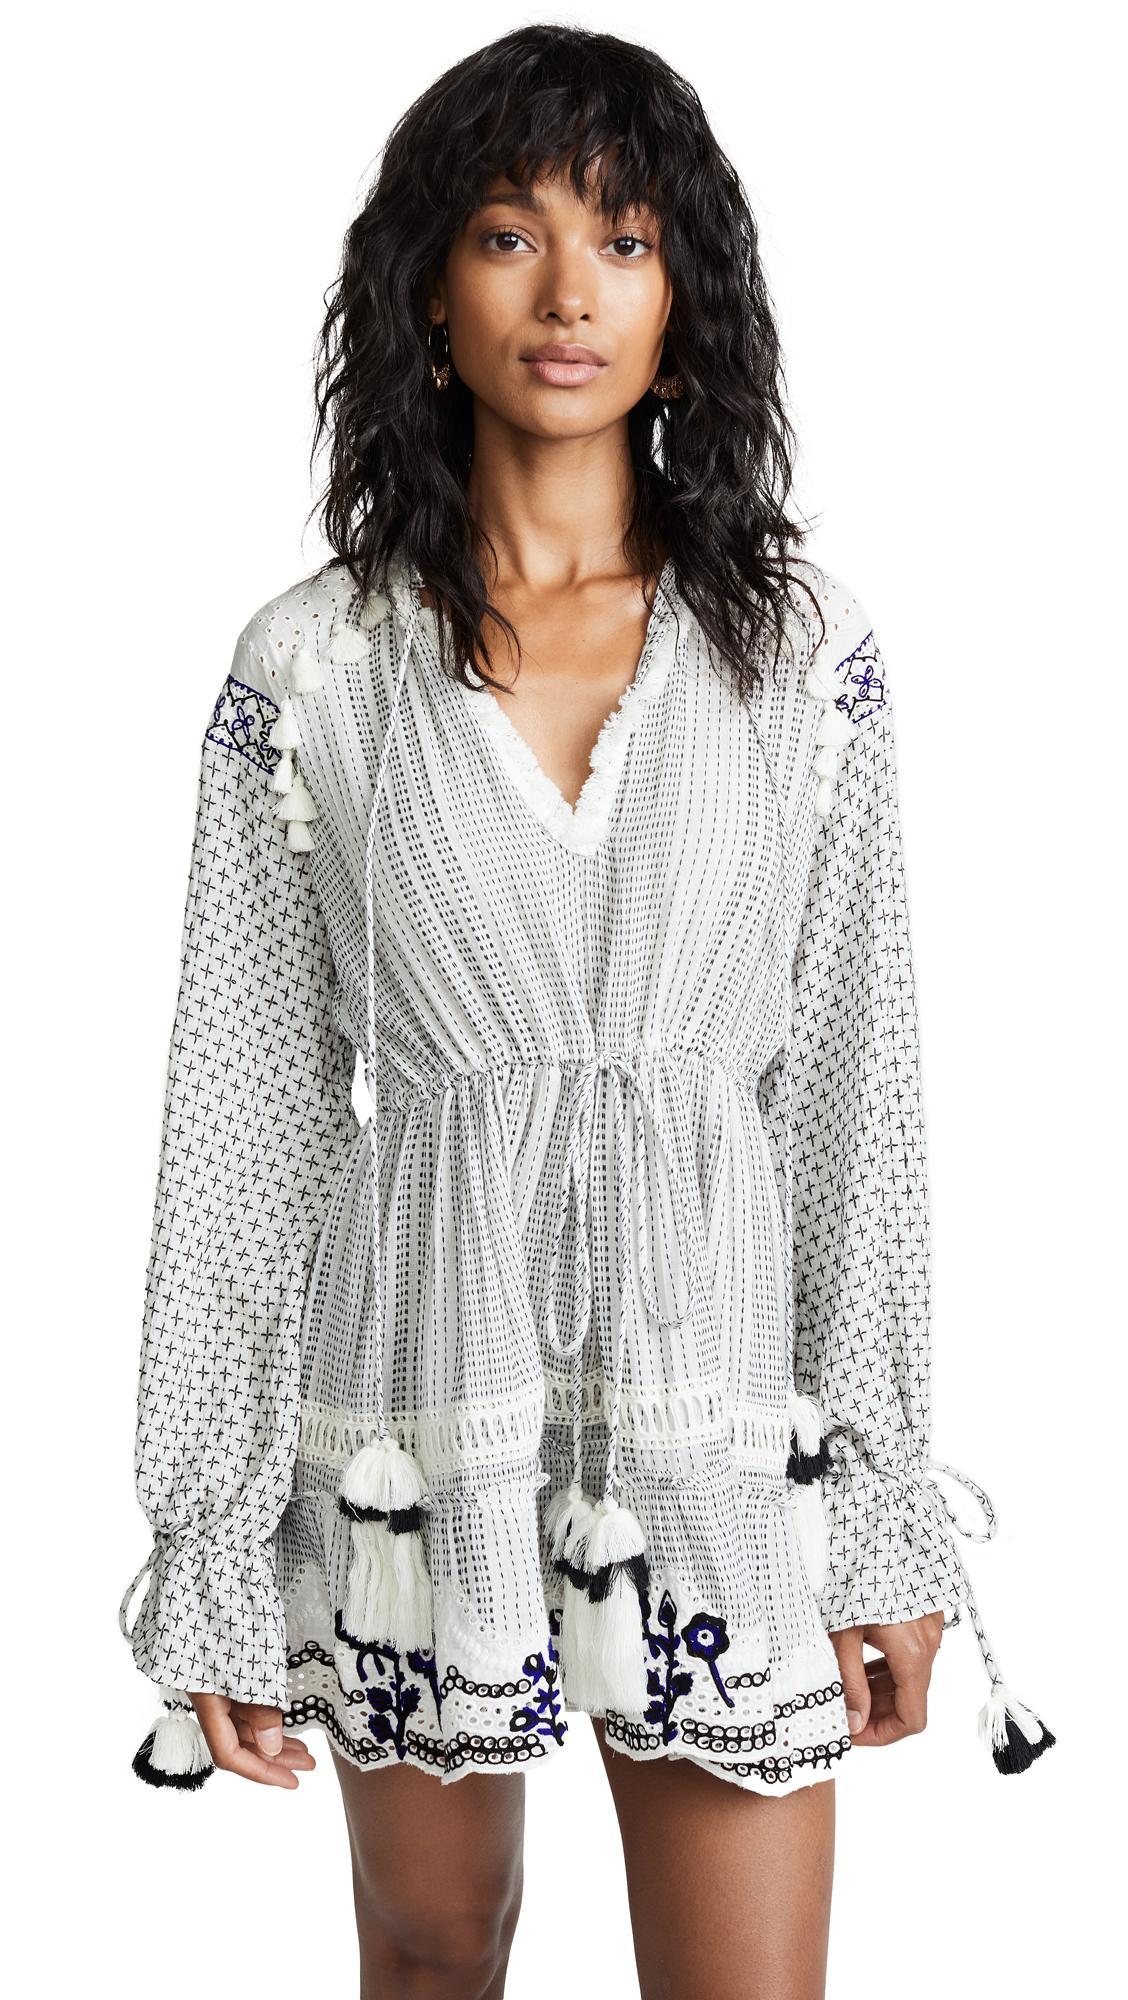 b384811adf7 Hemant   Nandita Short Dress In Black White